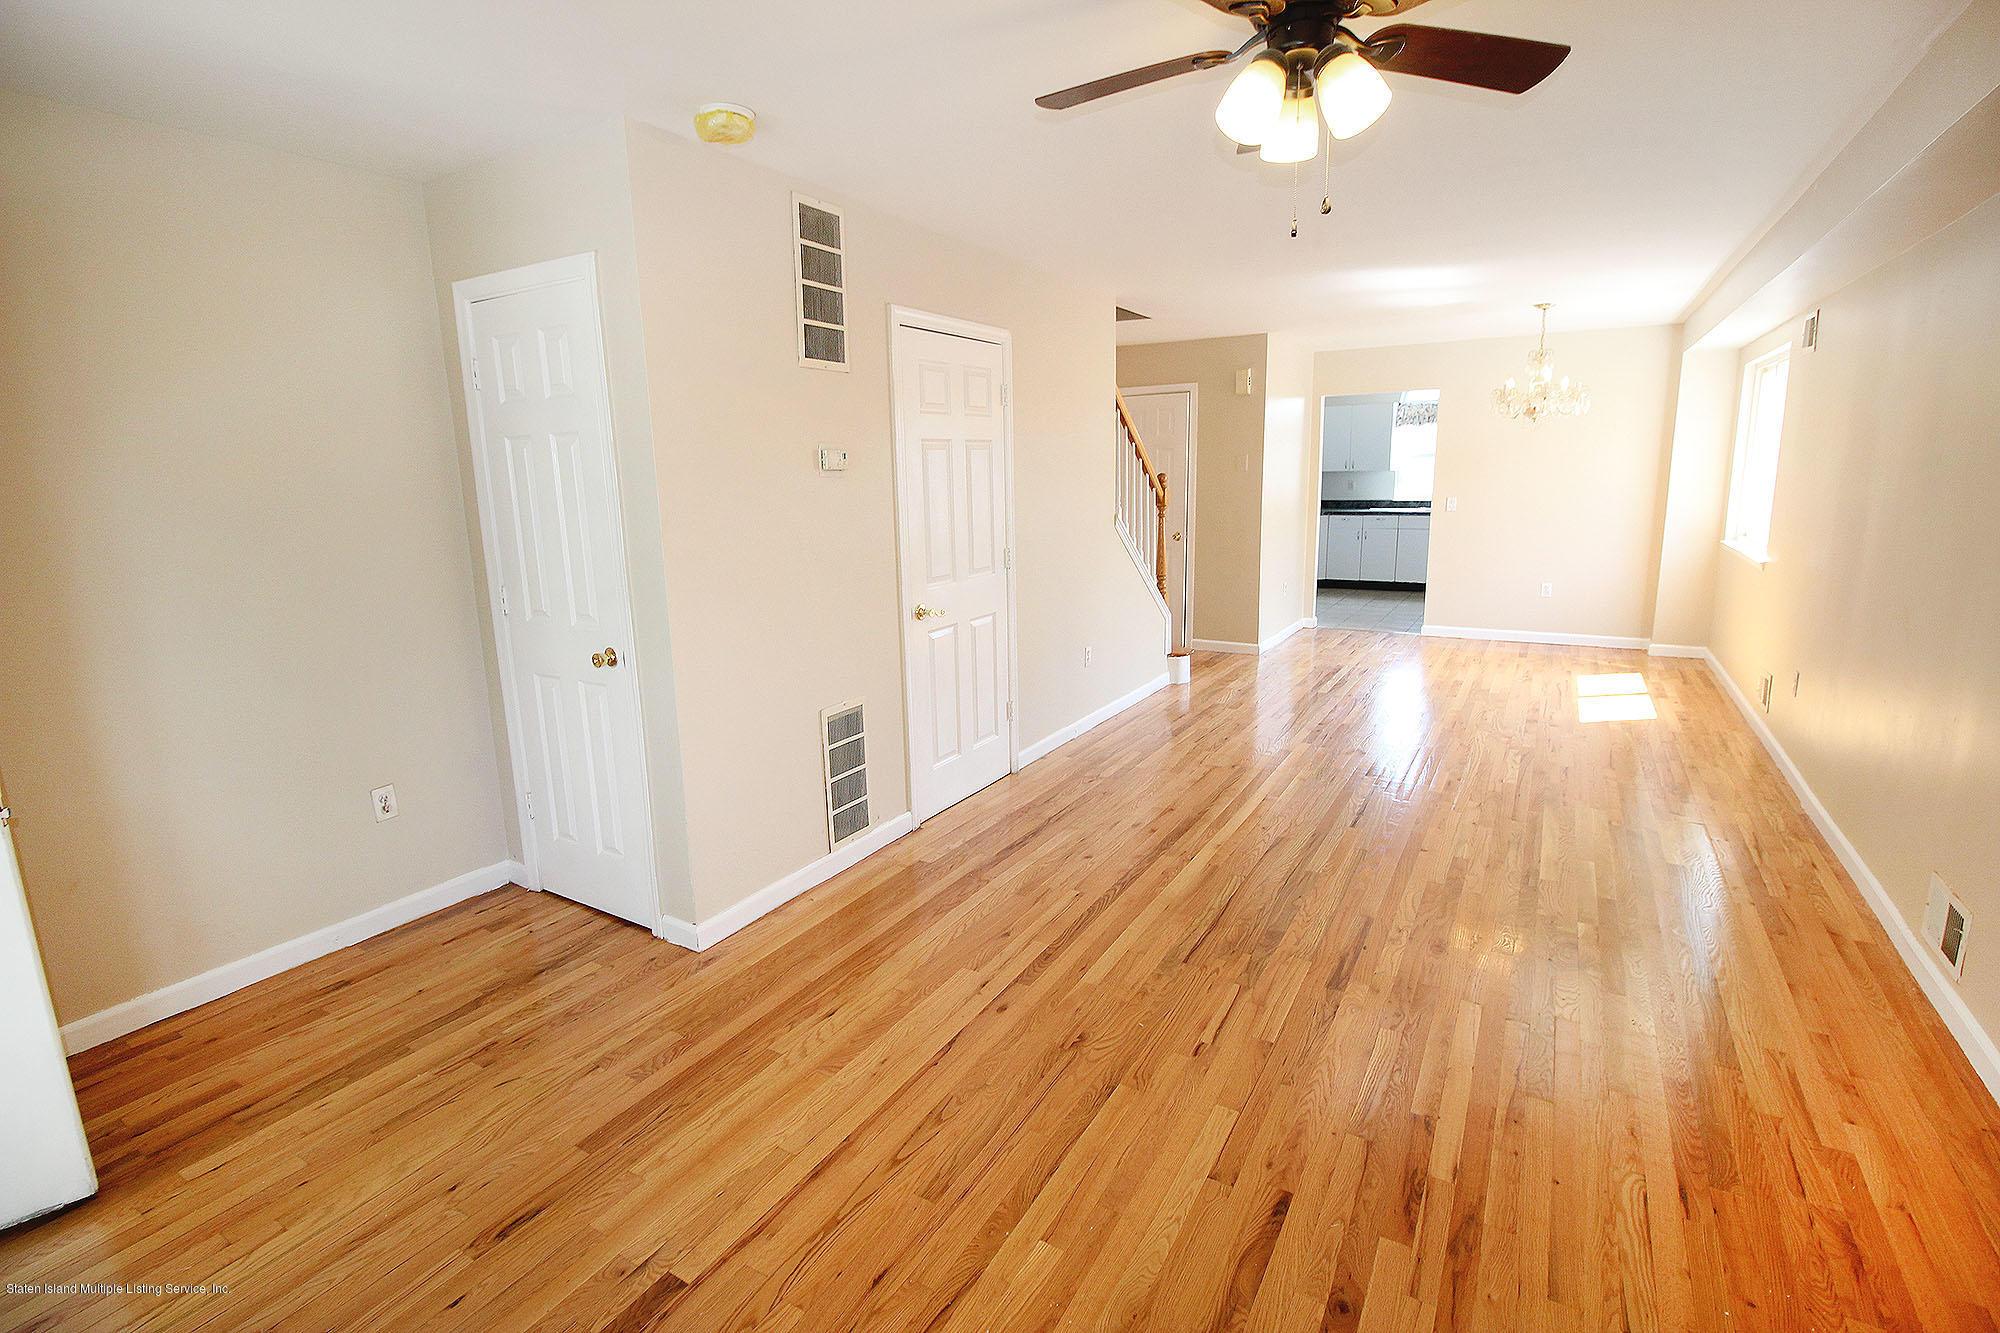 Single Family - Semi-Attached 230 Holden Boulevard  Staten Island, NY 10314, MLS-1139241-4